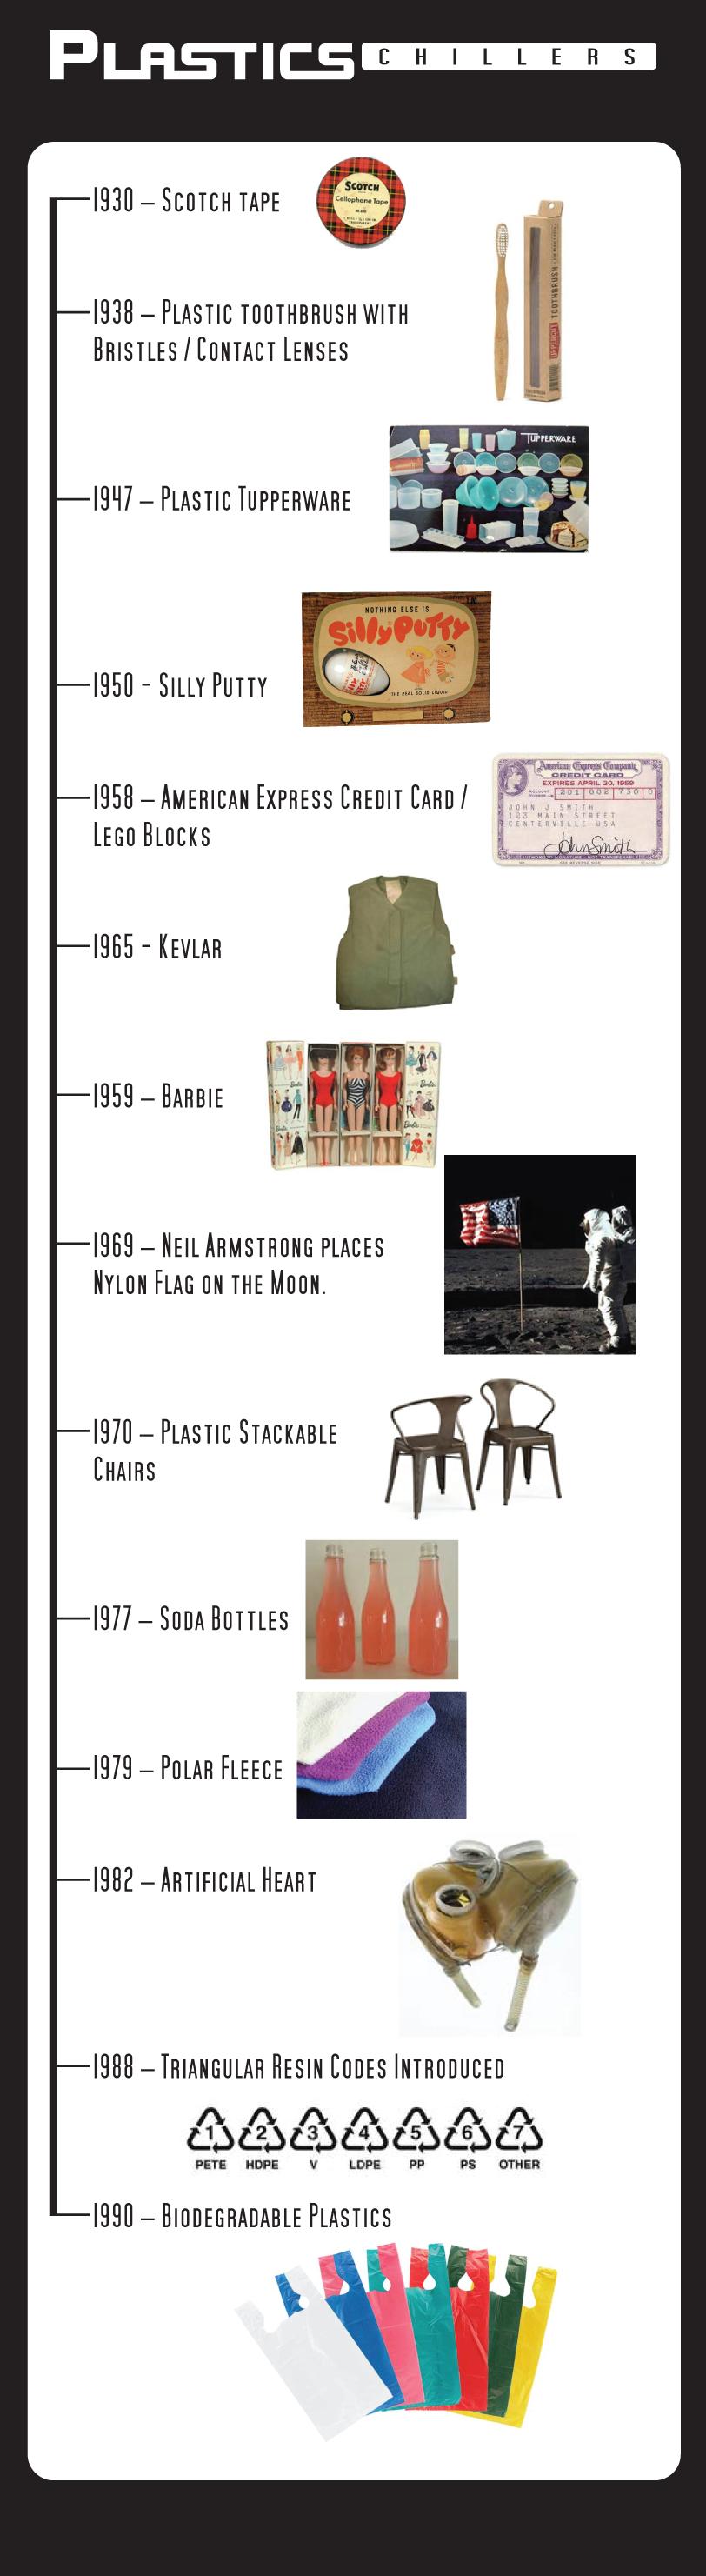 plastics-timeline